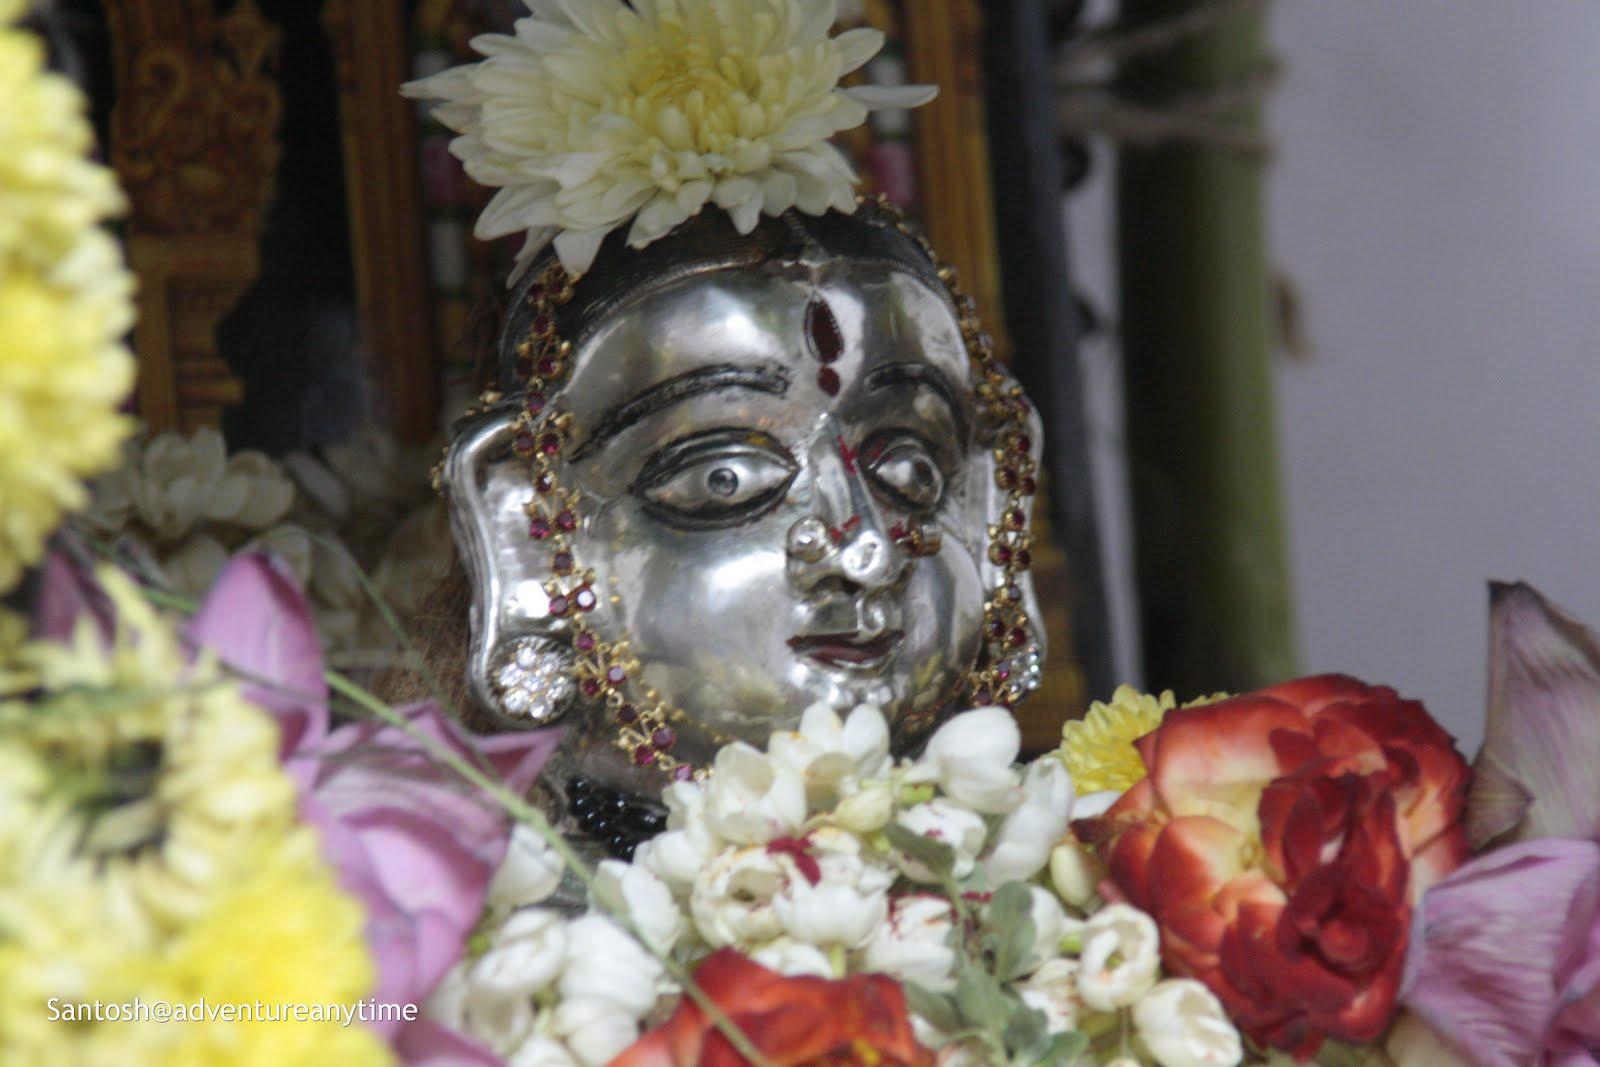 Ganesh chaturthi flowers may flower blog - Goddess Gauri Idol As Part Of Ganesh Chaturthi Celebrations In The South India